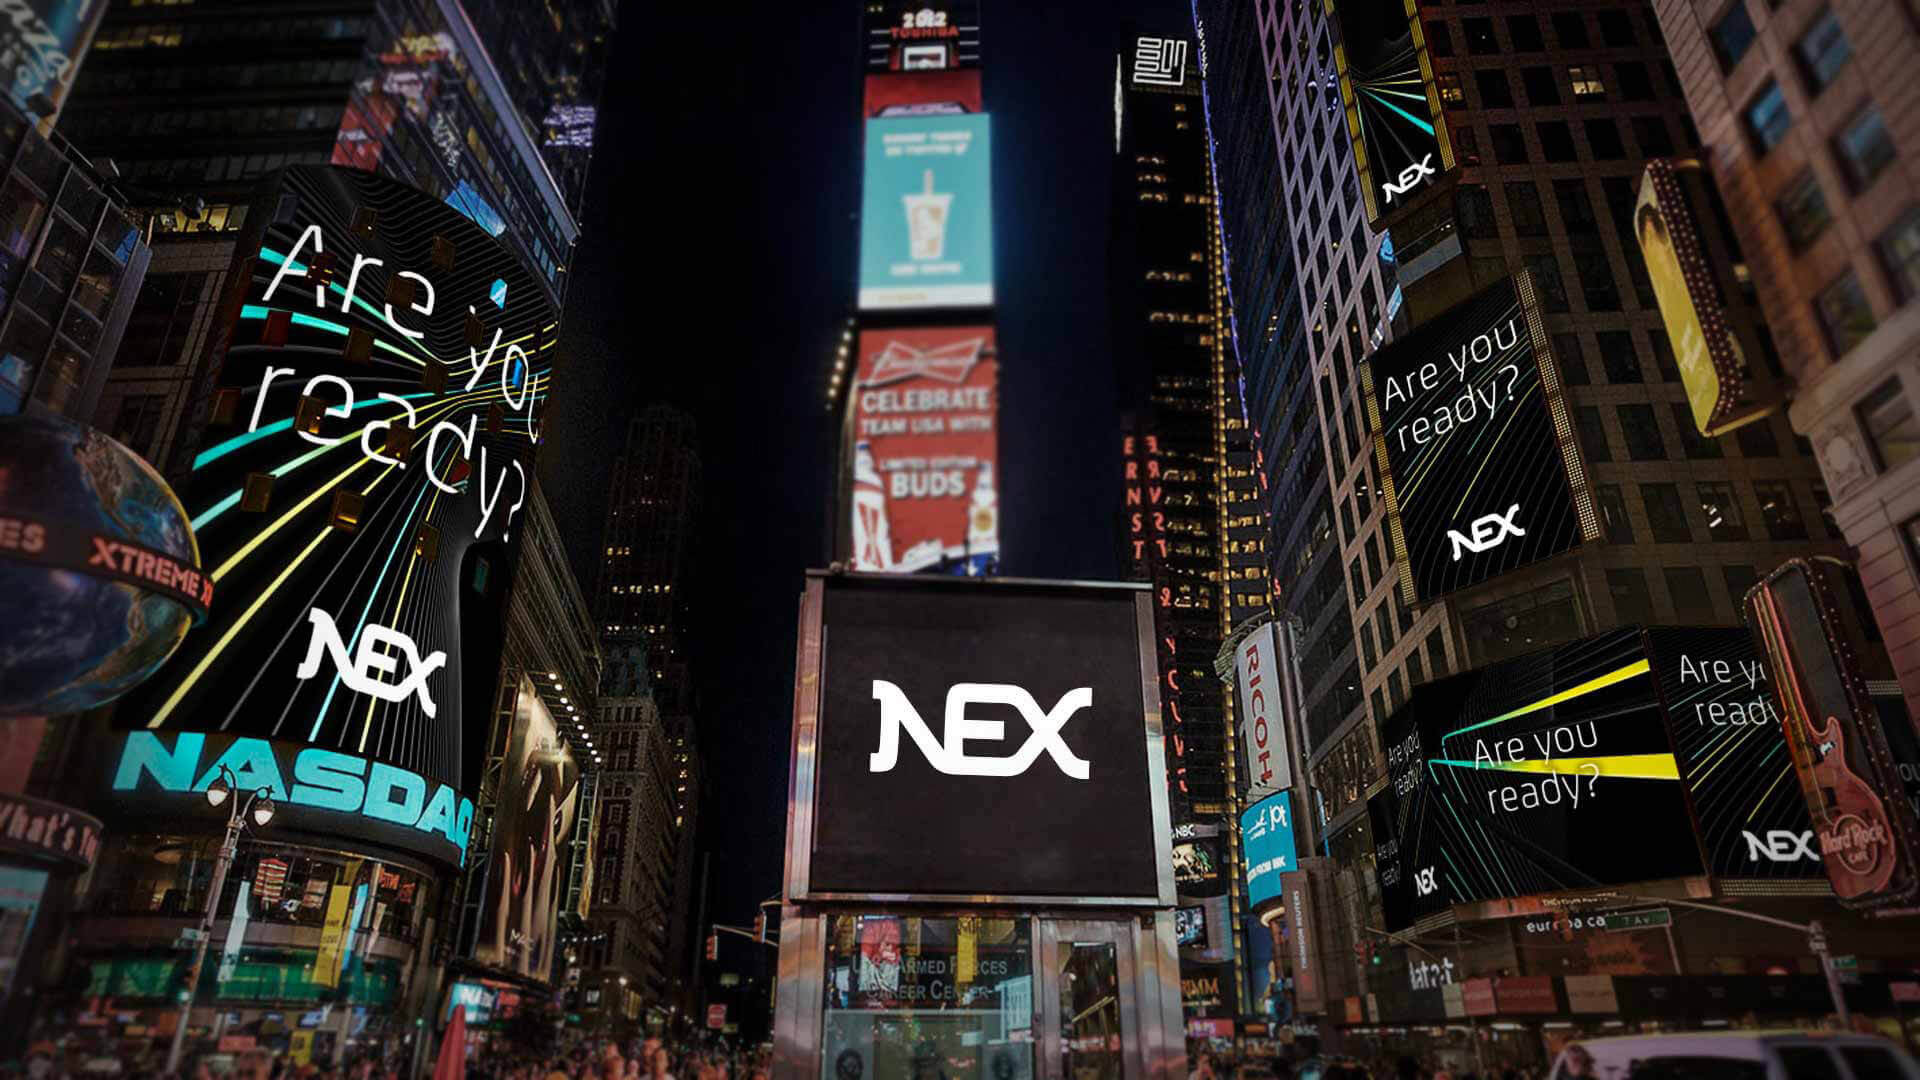 Nex Times Square